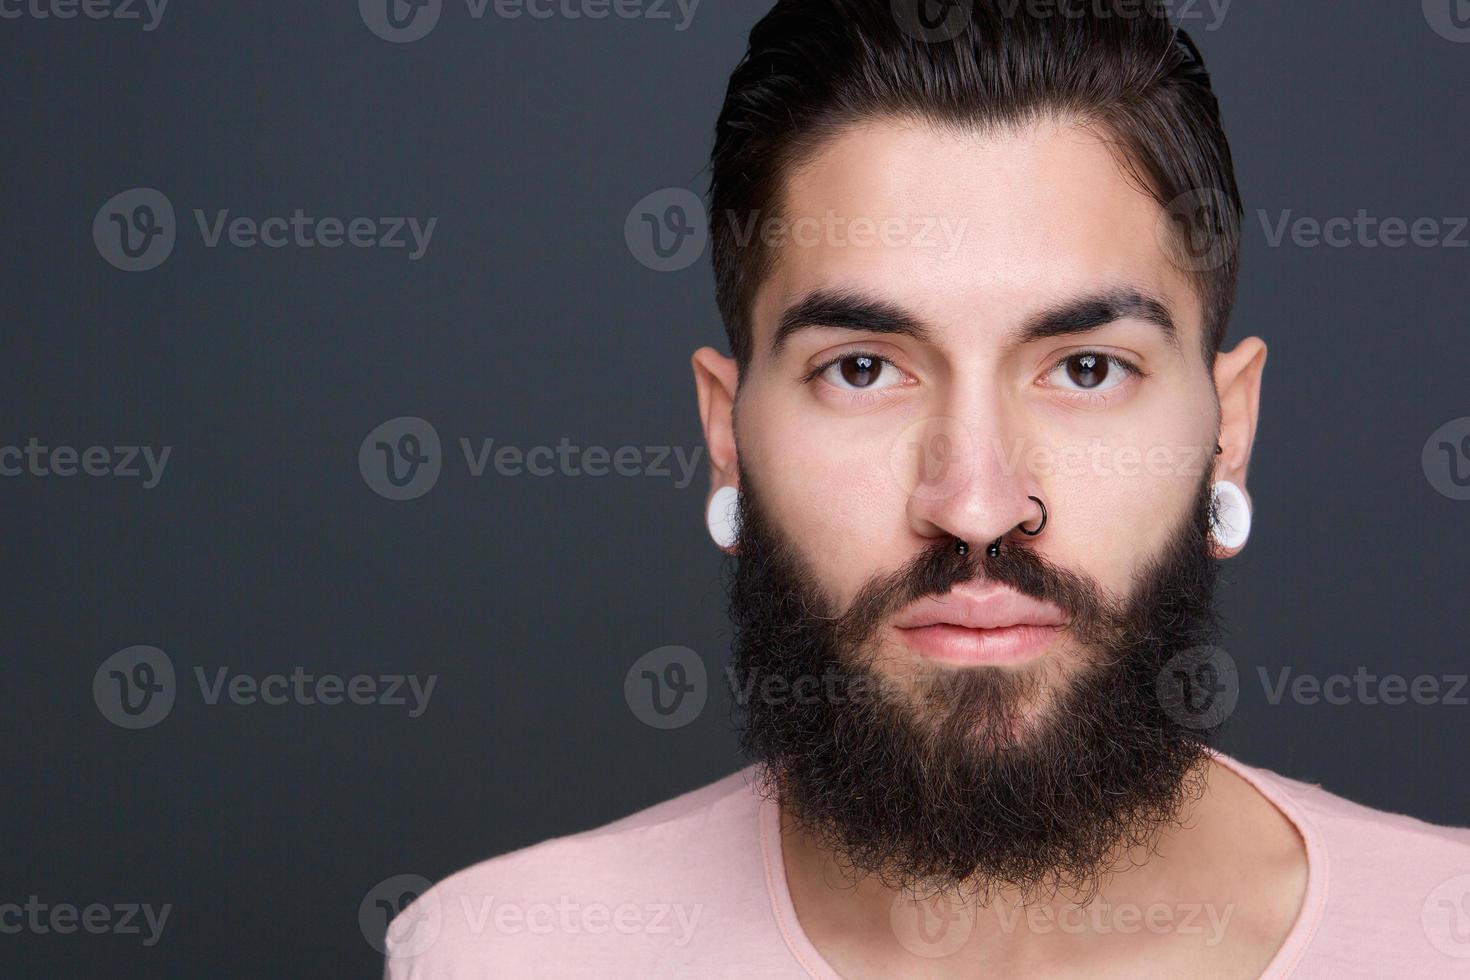 jovem com barba e piercings foto